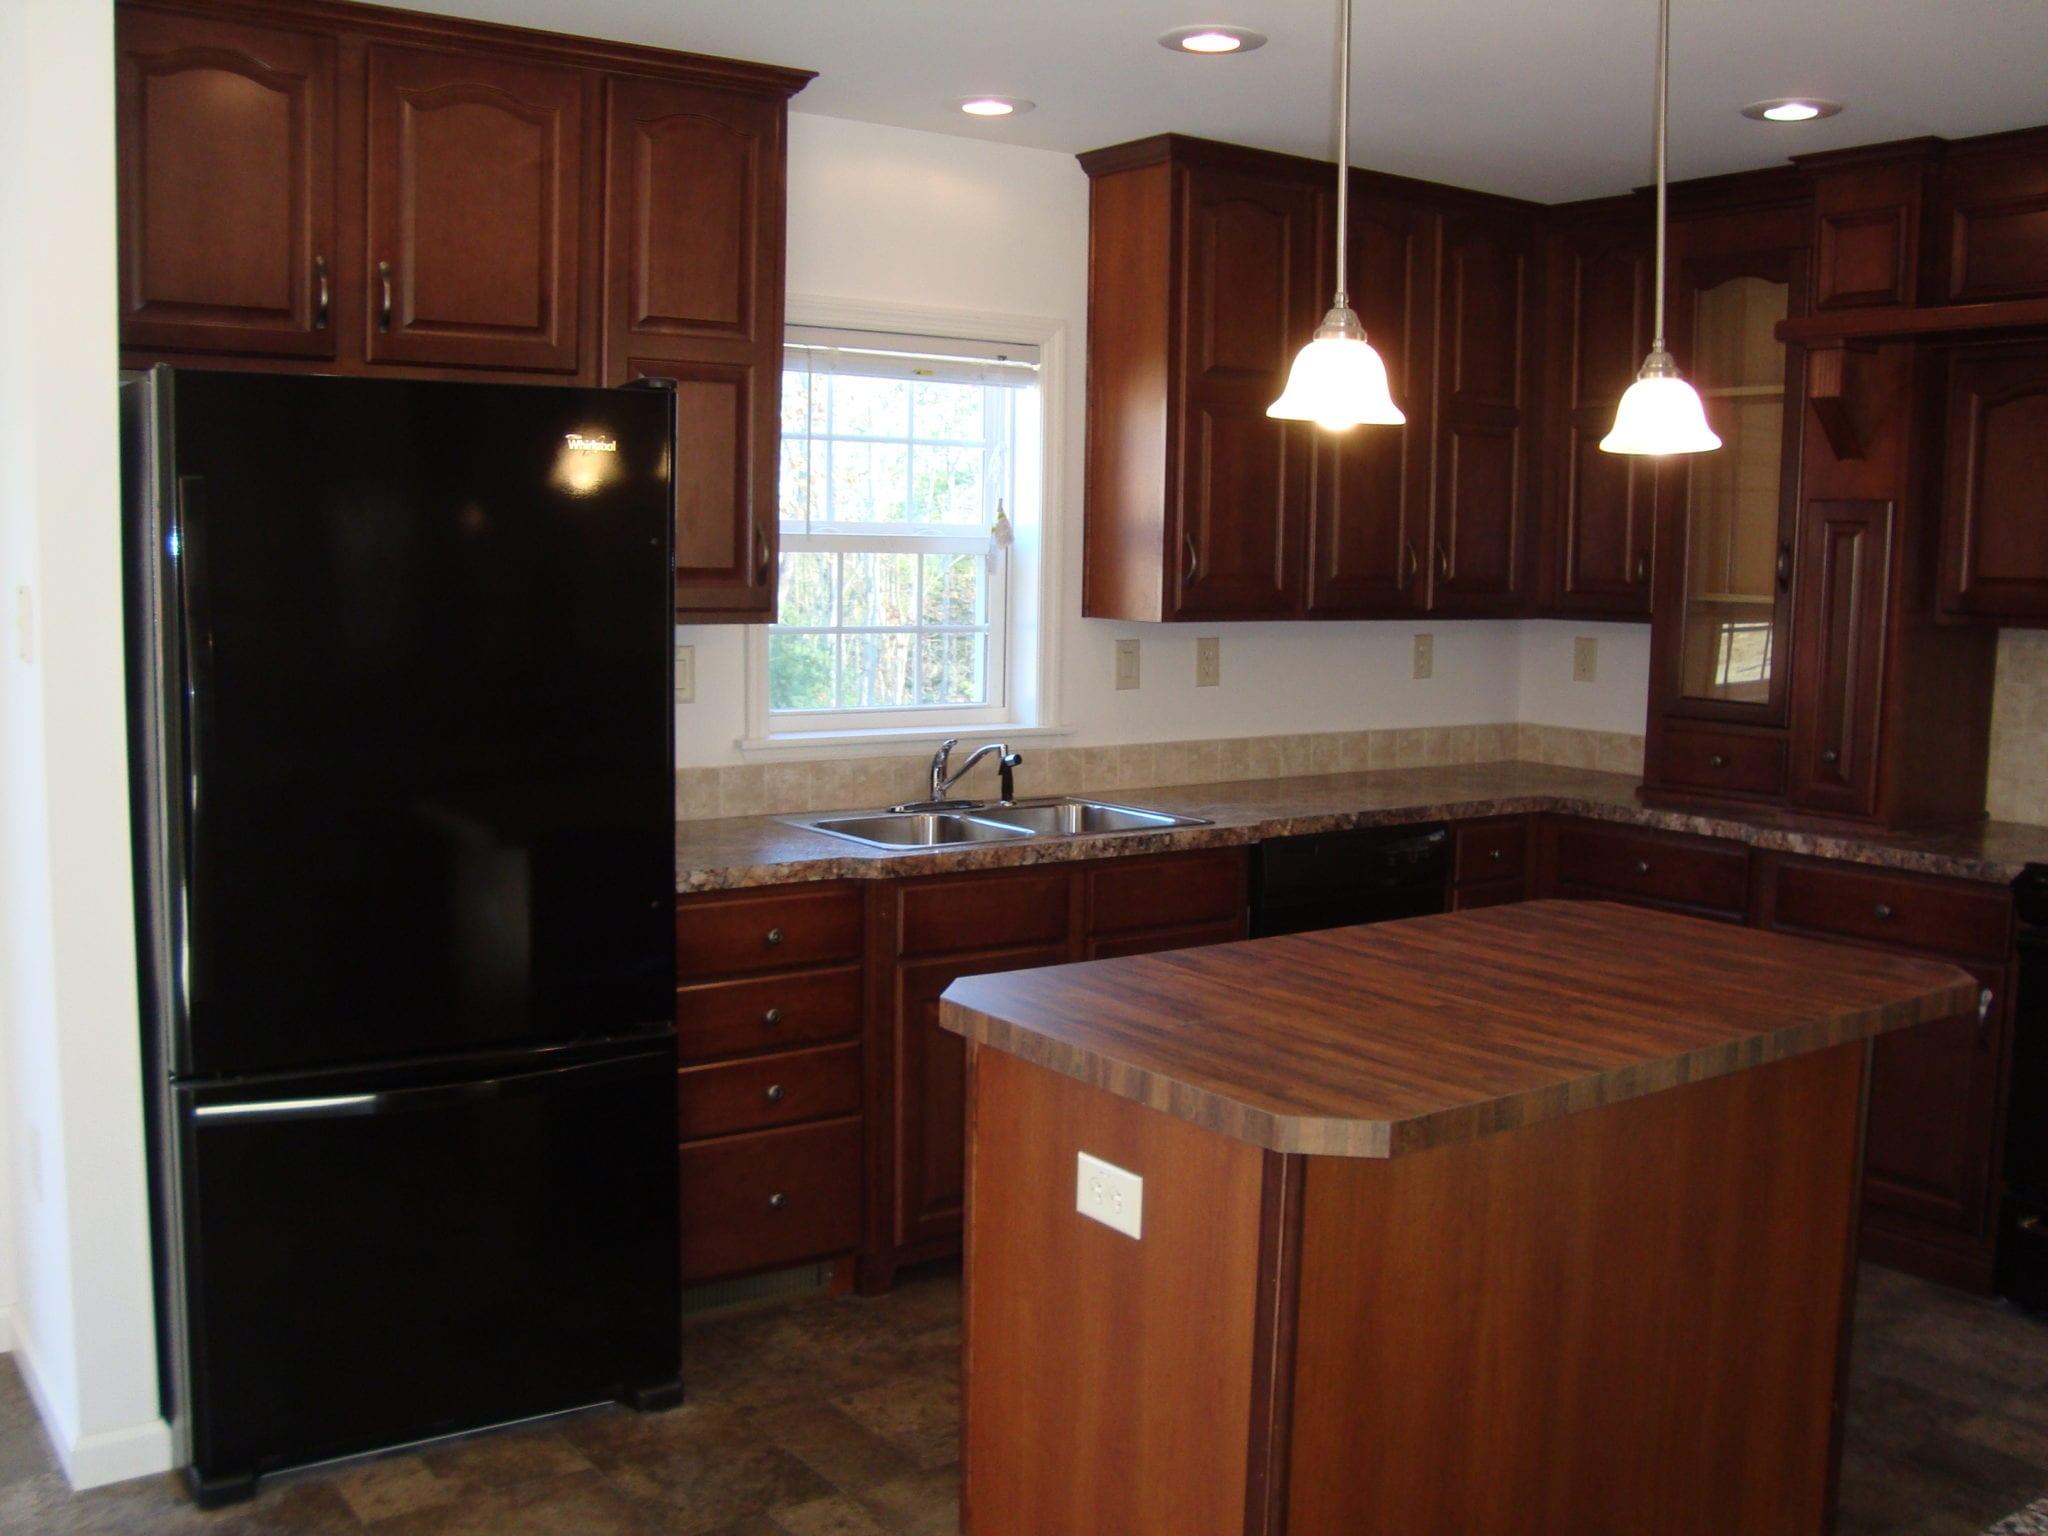 42″ Overhead Kitchen Cabinets